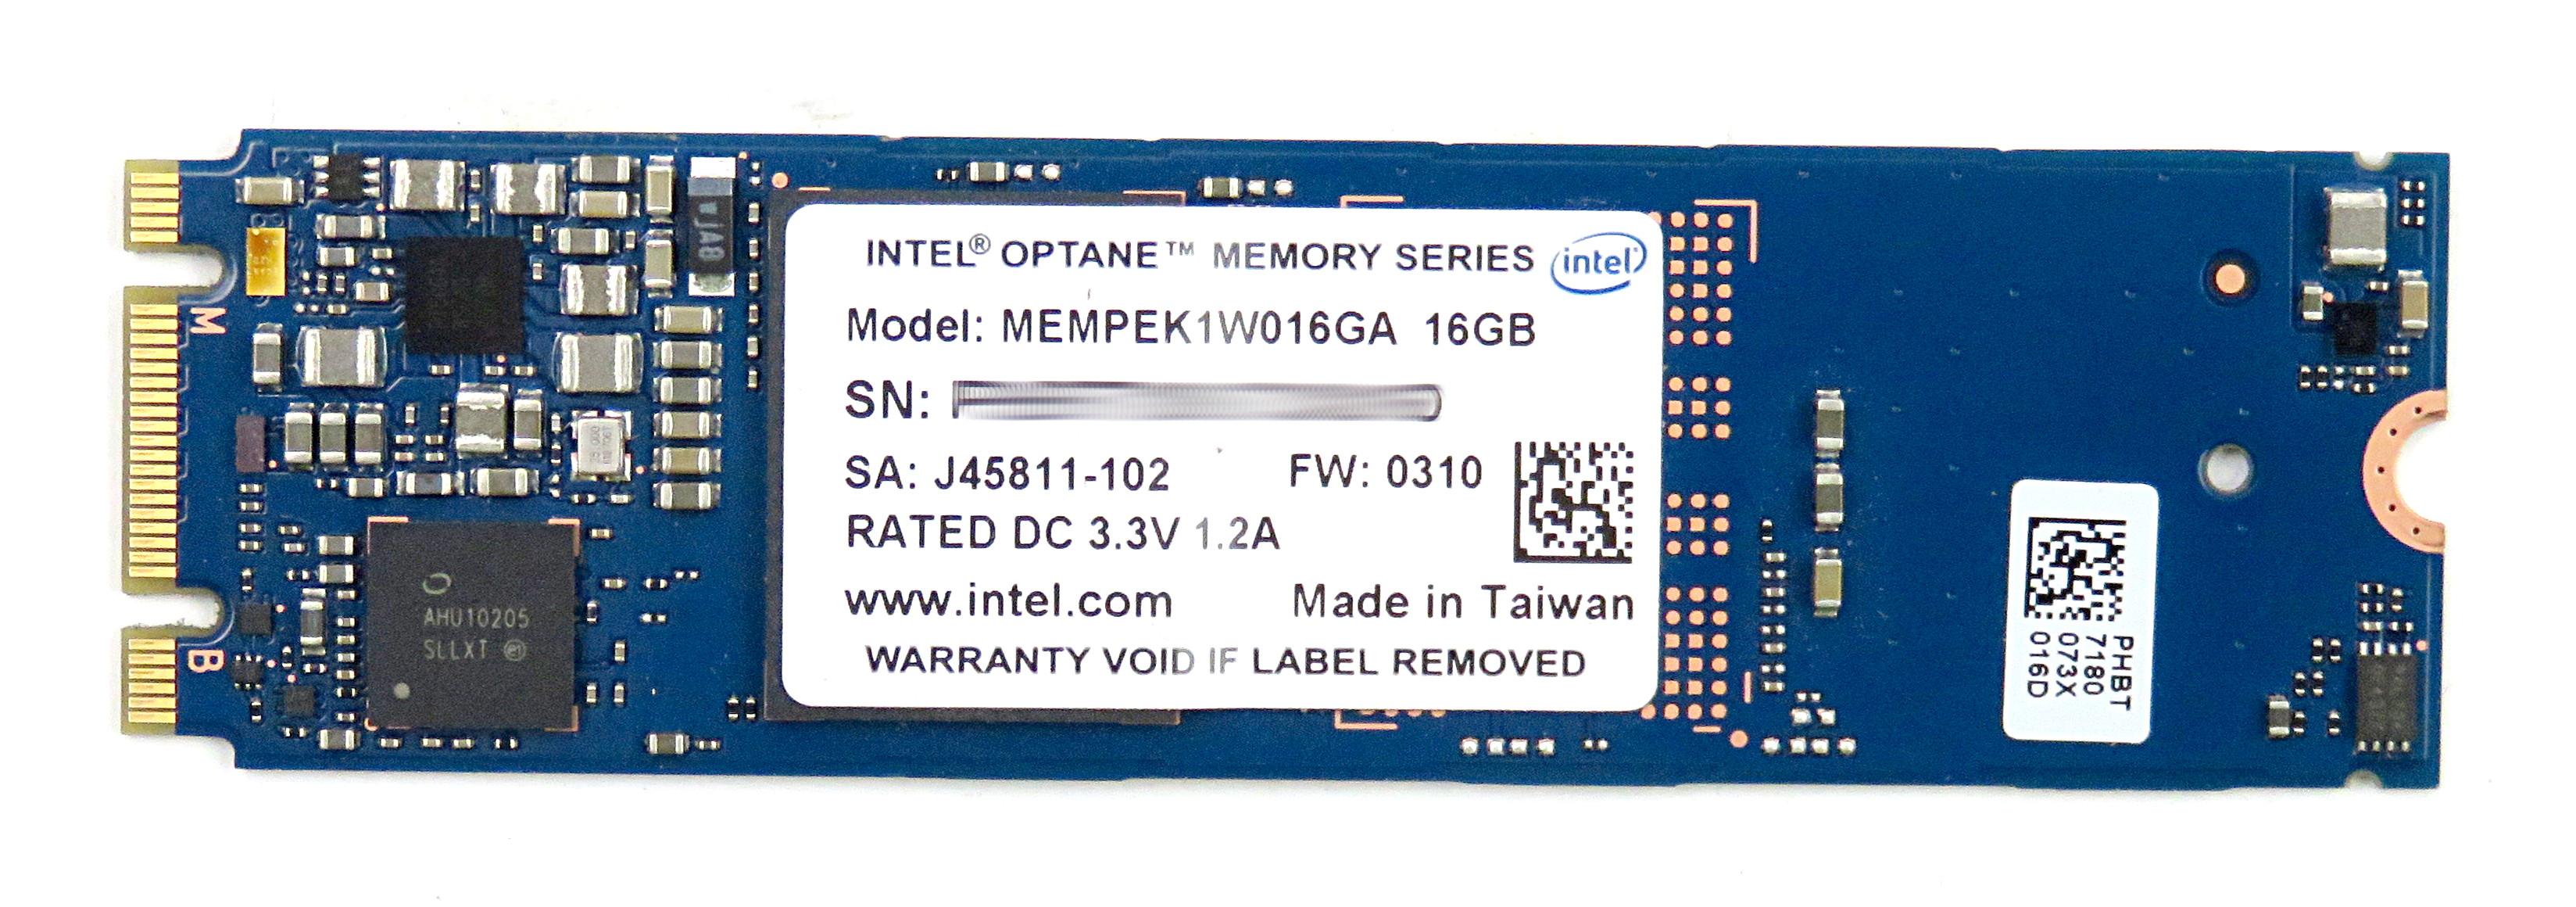 Intel Optane 16GB M.2 3D XPoint HDD Accelerator MEMPEK1W016GA